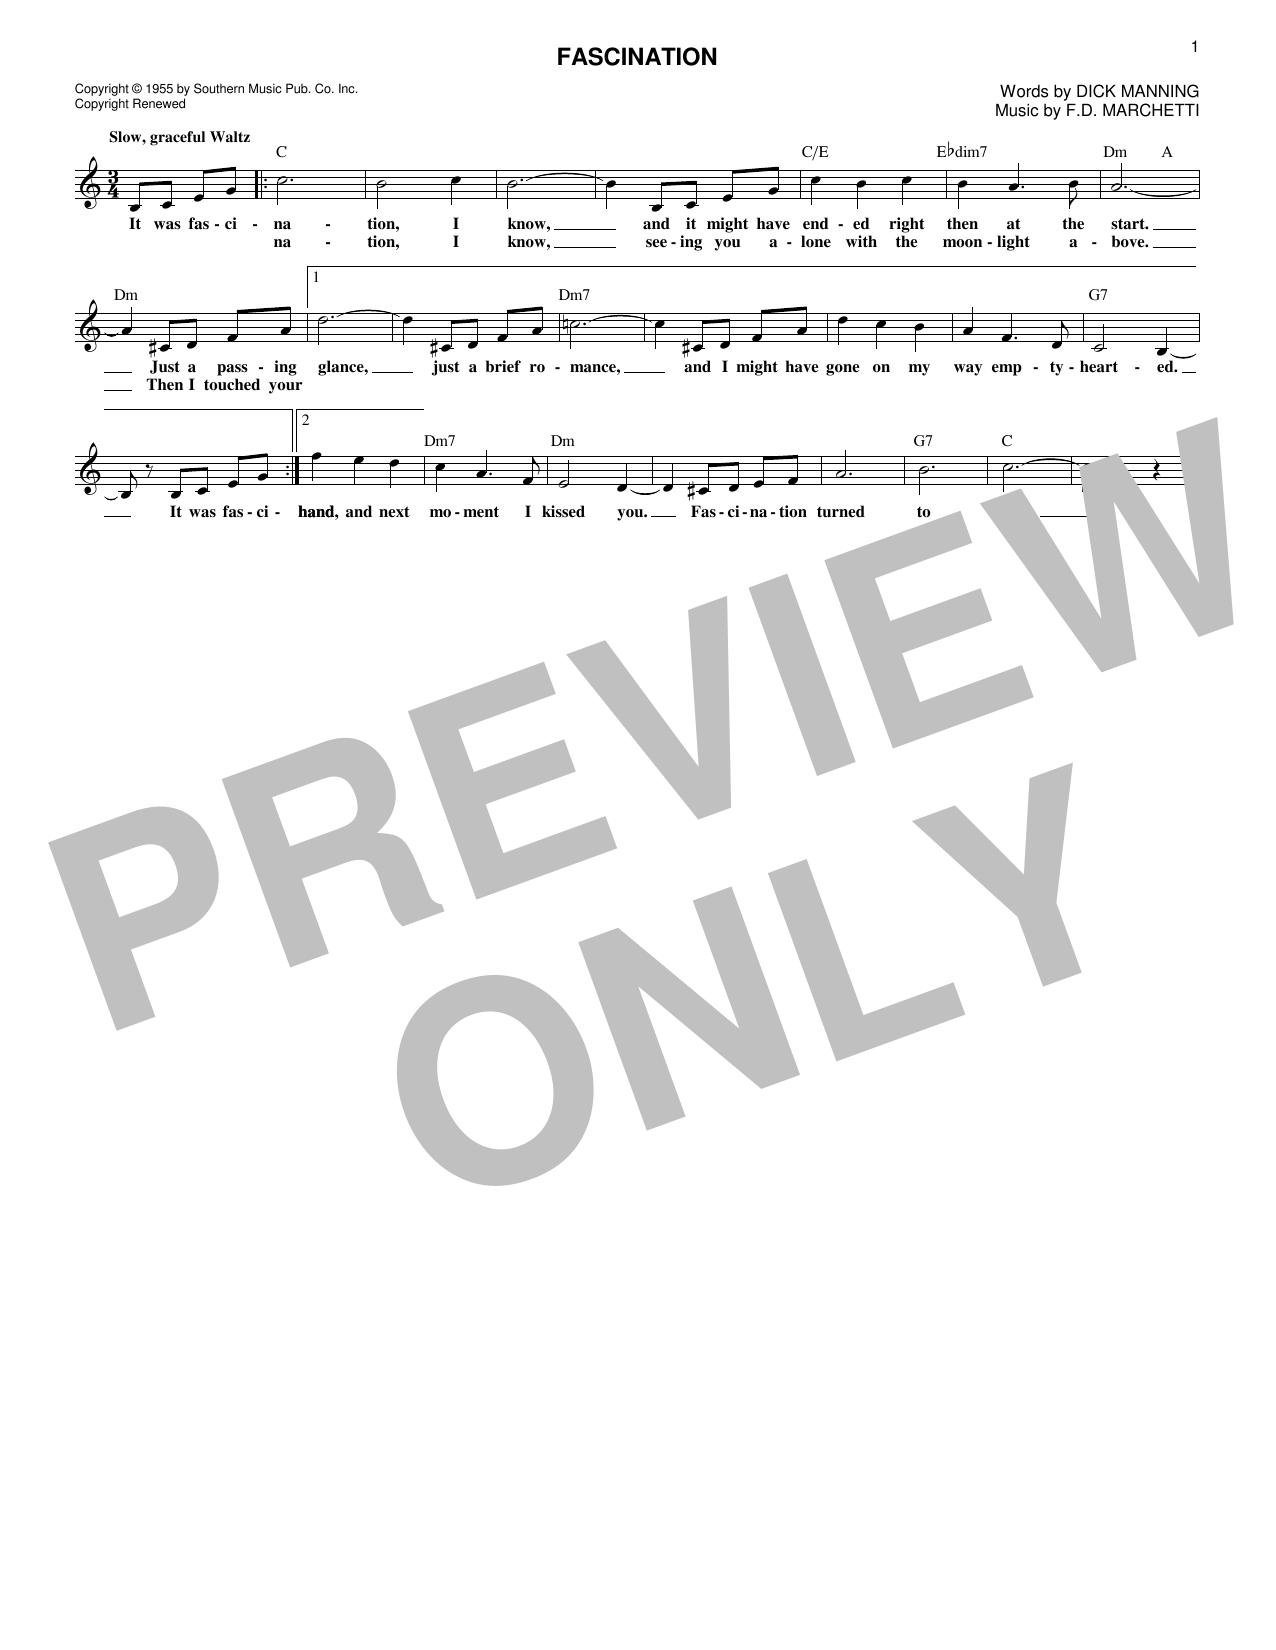 Dinah Shore Fascination sheet music notes and chords. Download Printable PDF.